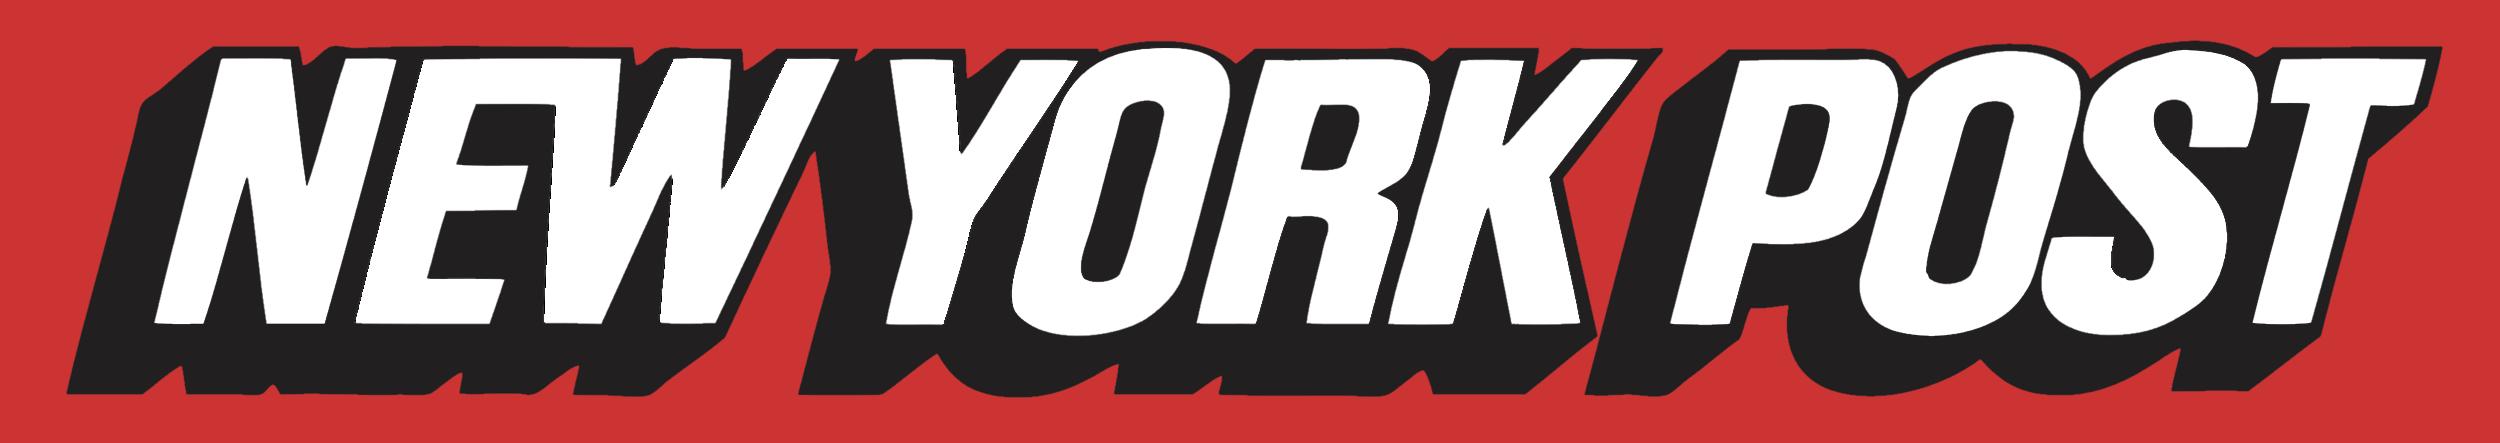 Media- New York Post Logo.png